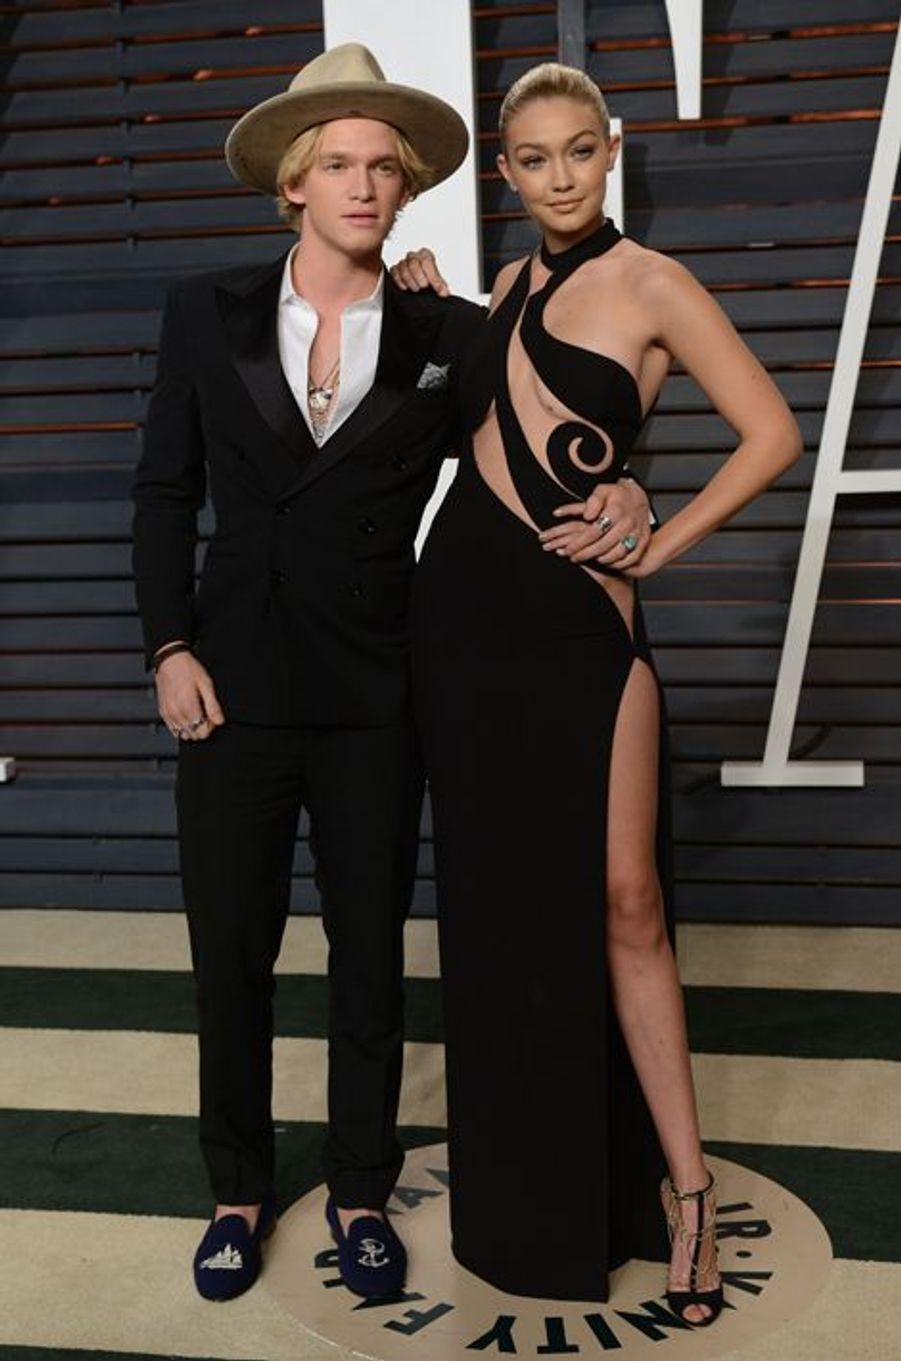 Gigi Hadid et Cody Simpson lors de la soirée Vanity Fair des Oscars 2015